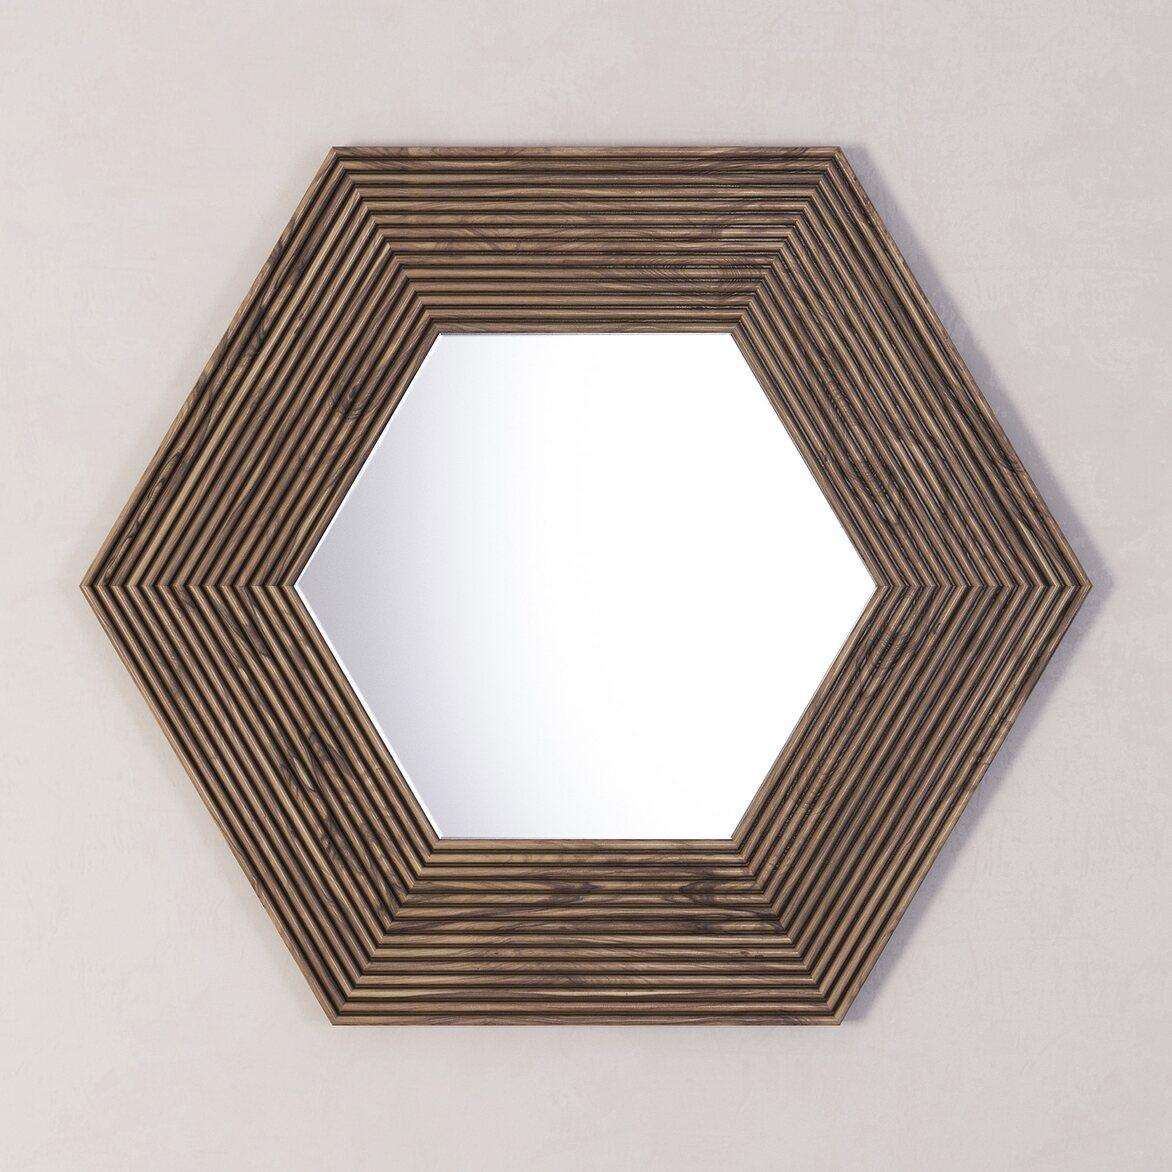 Зеркало Сorners | Настенные зеркала Kingsby